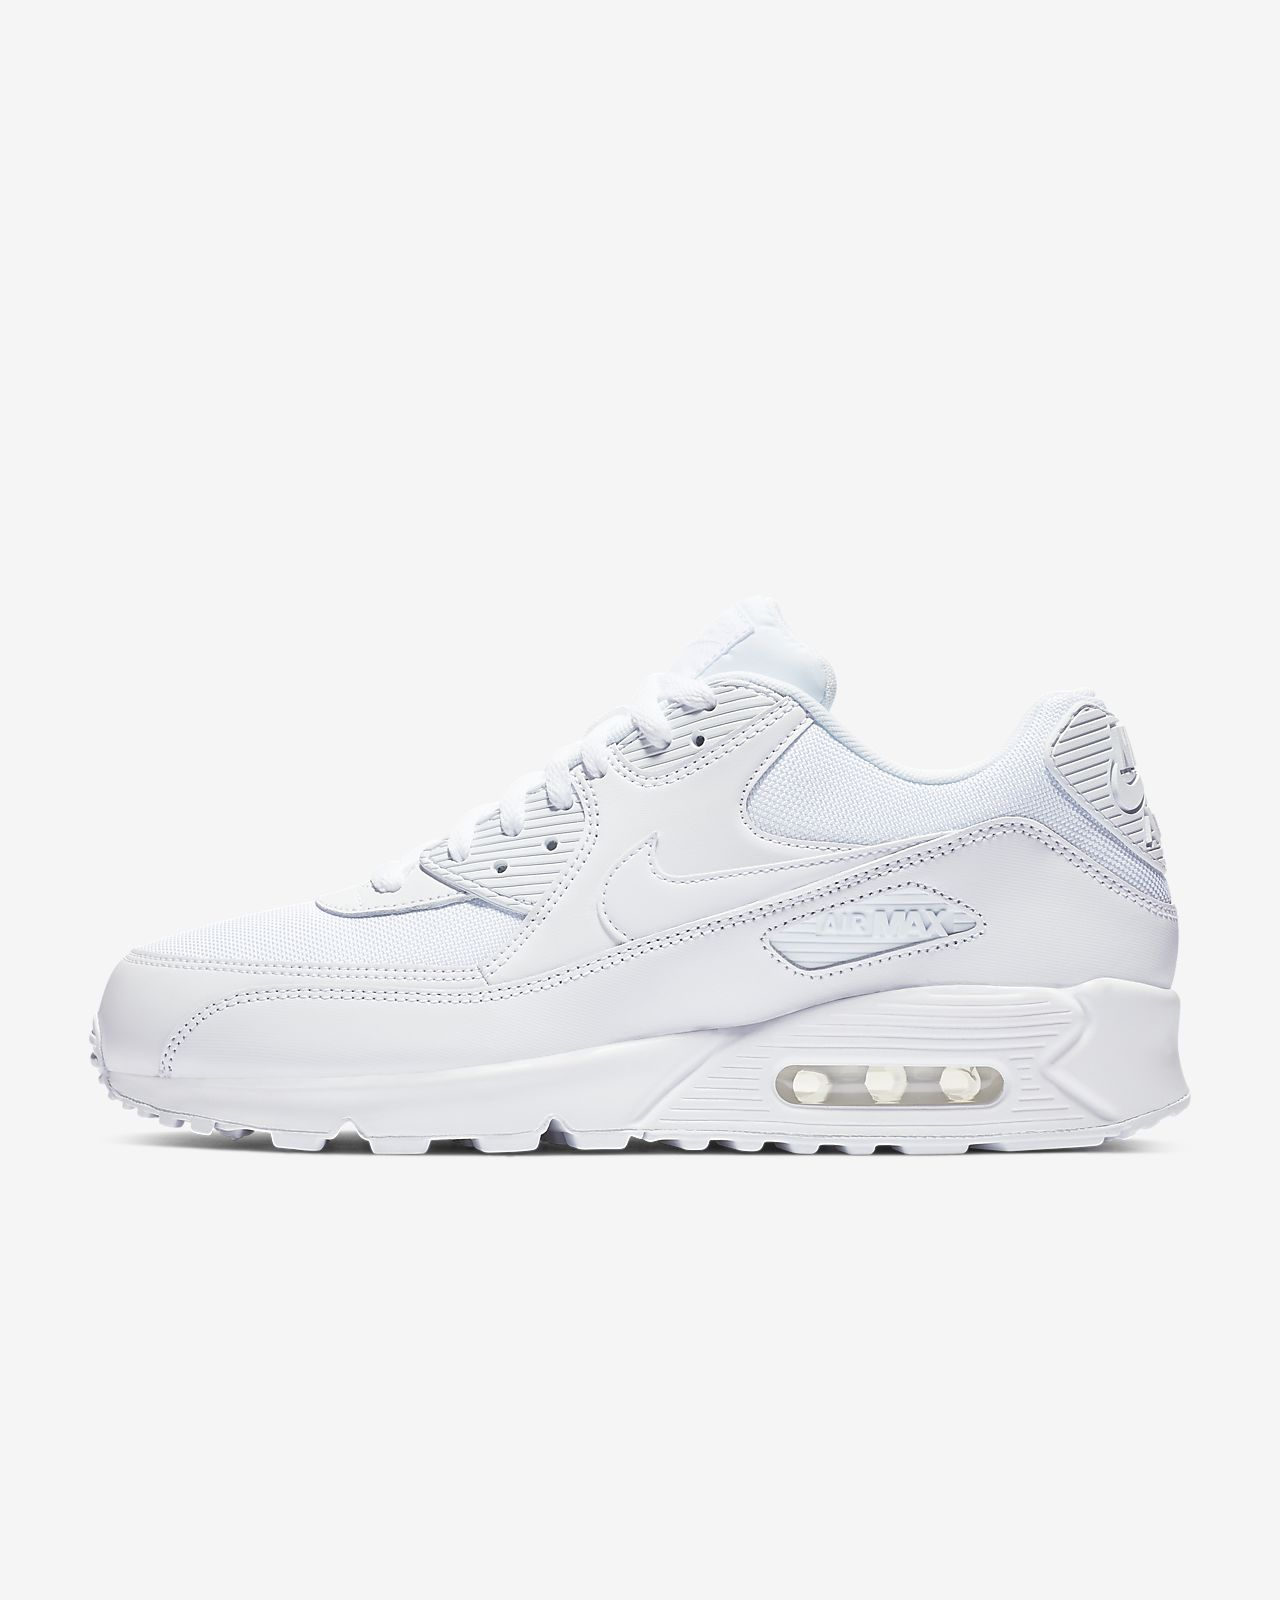 wholesale dealer 527ad 706ae ... รองเท้าผู้ชาย Nike Air Max 90 Essential